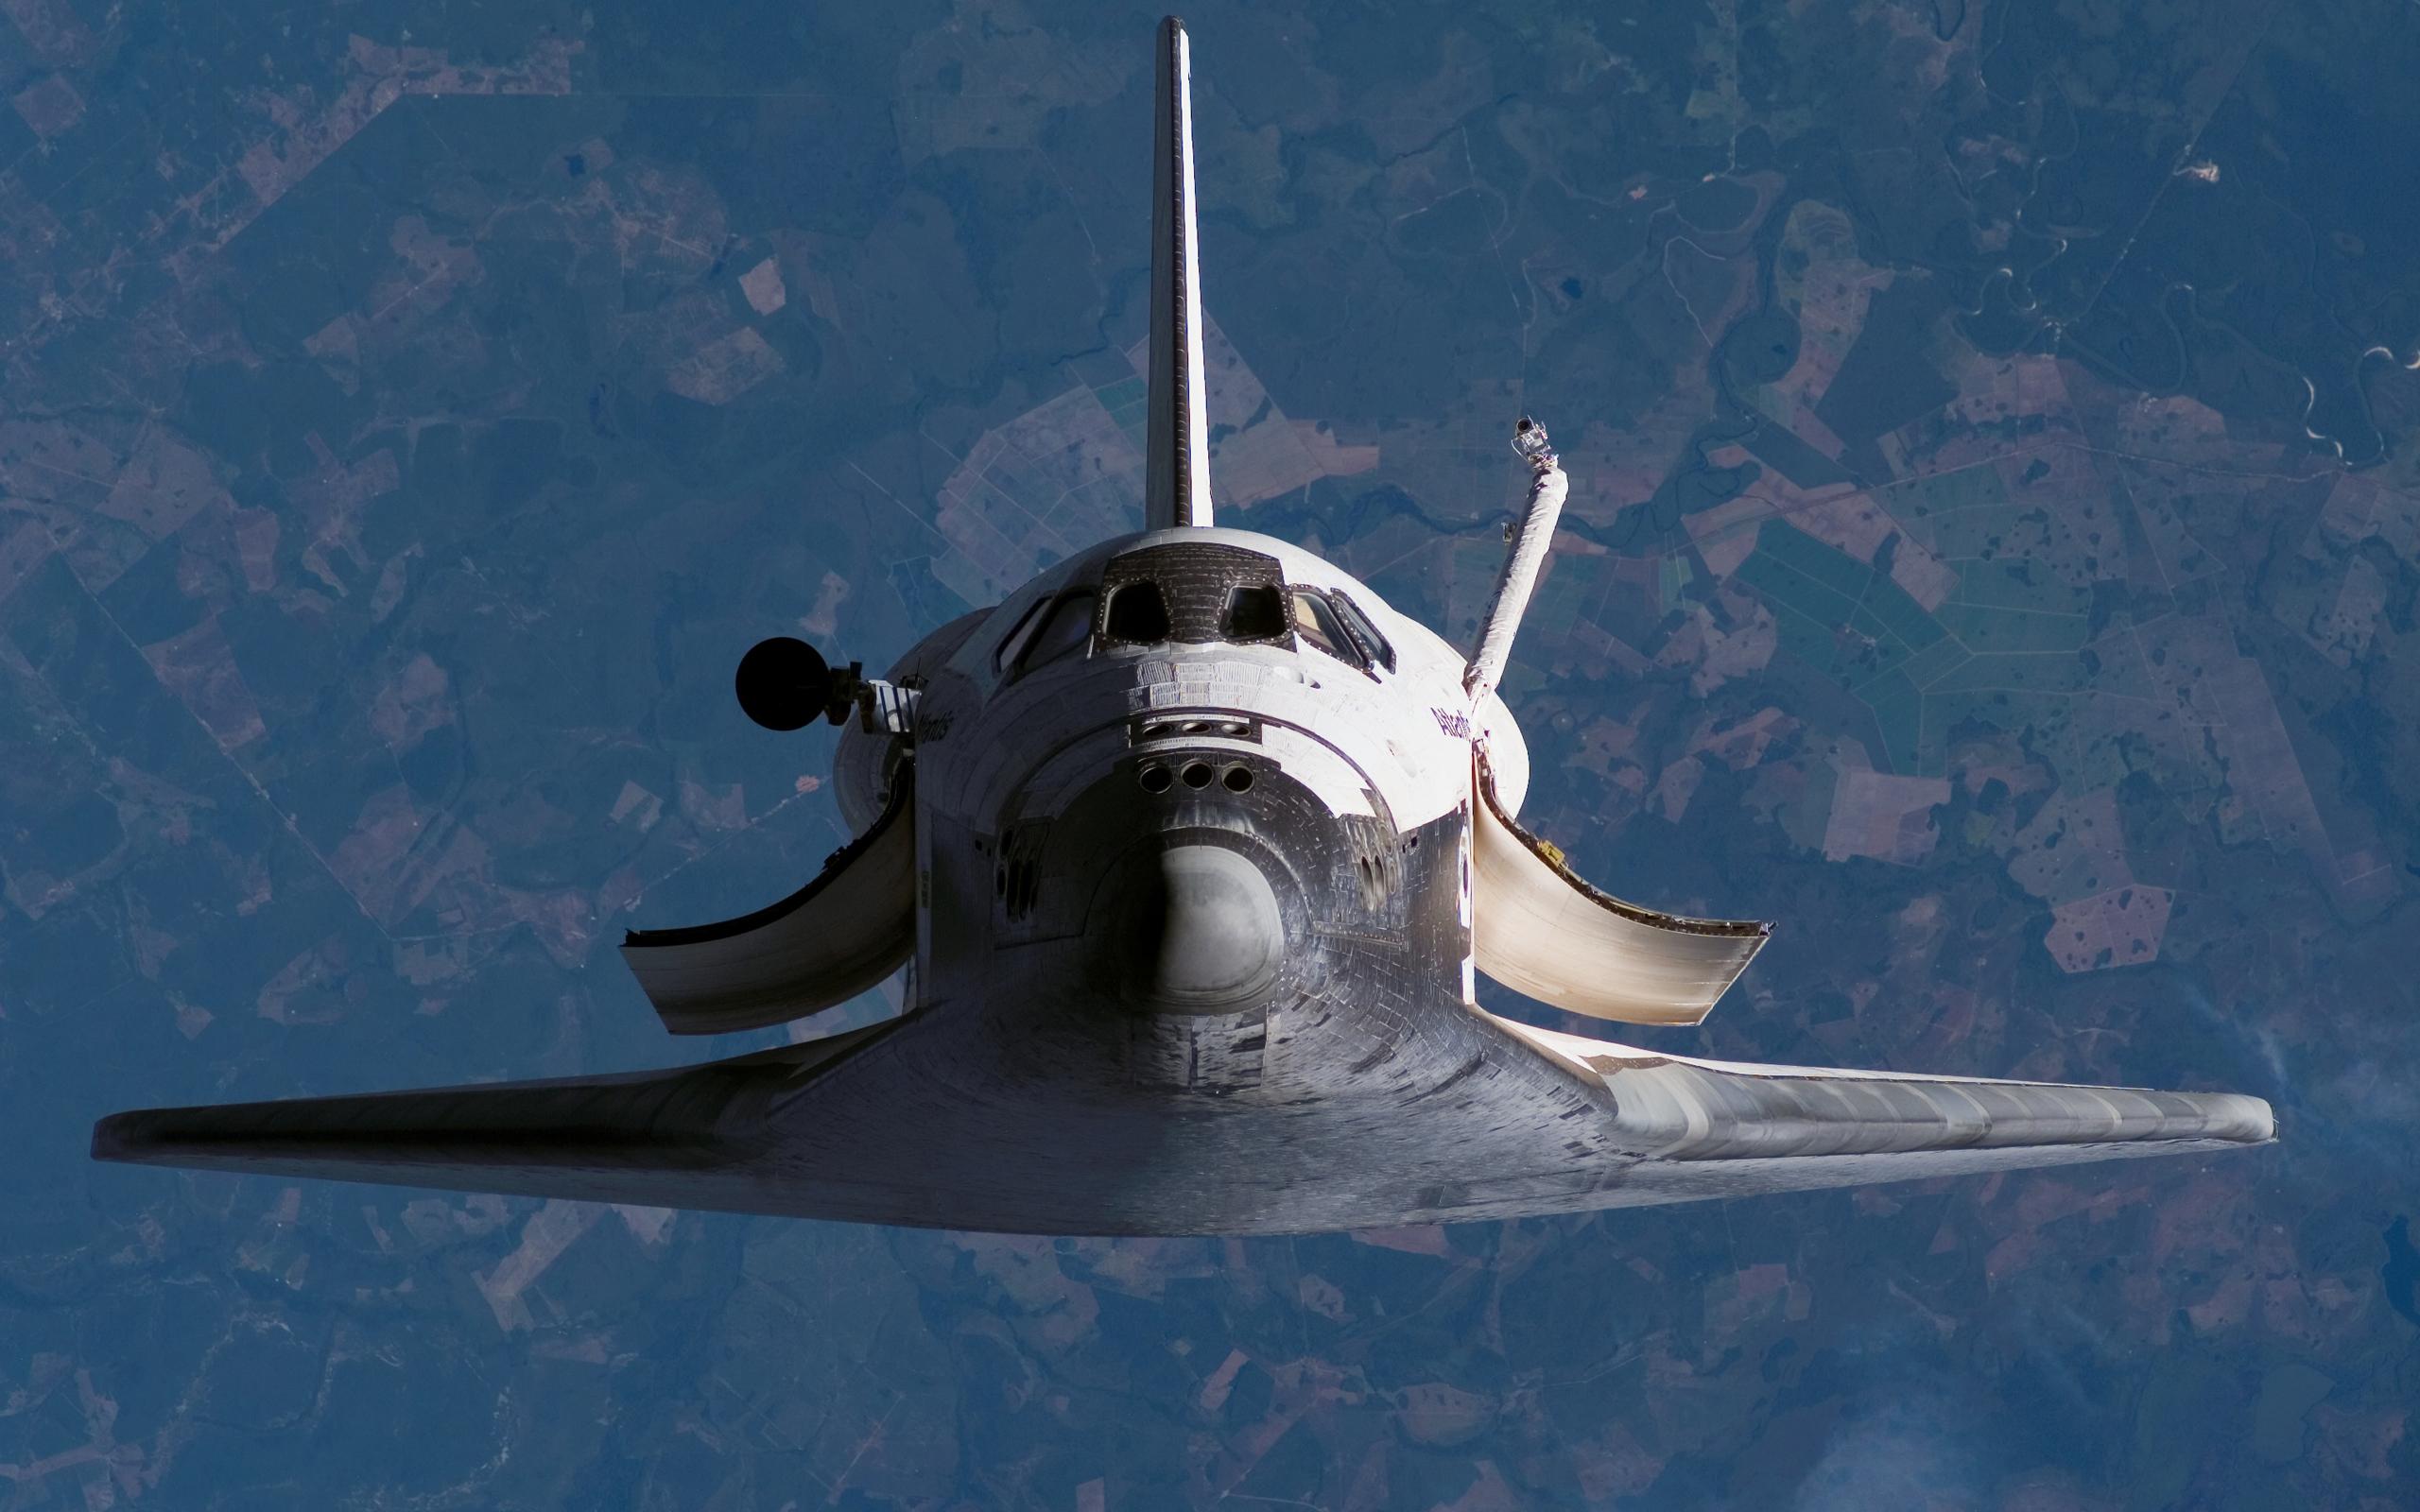 SpaceShuttleAtlantis